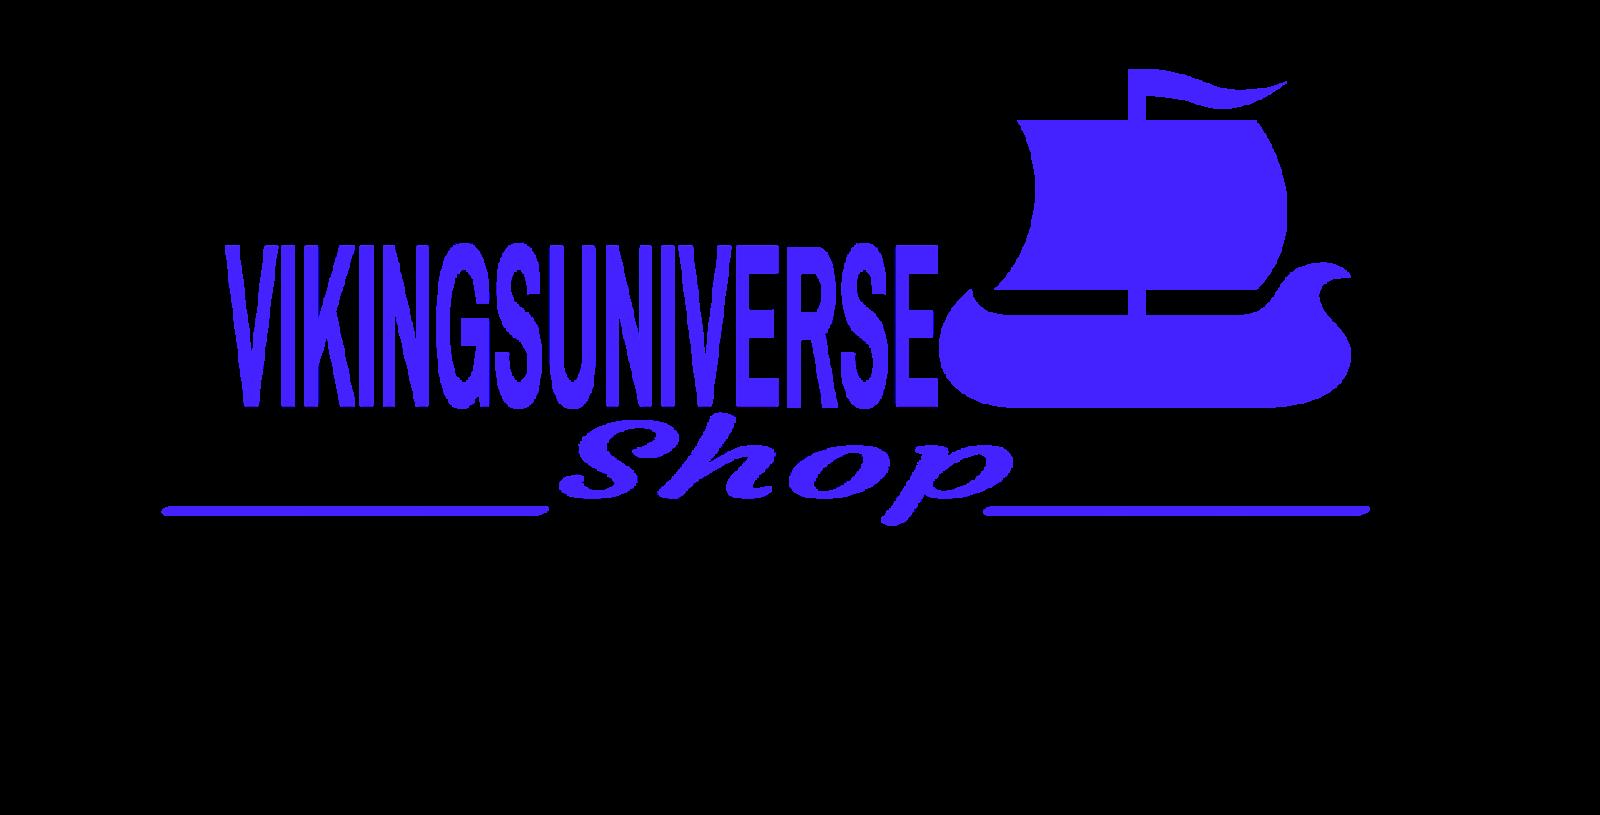 VikingsUniverse